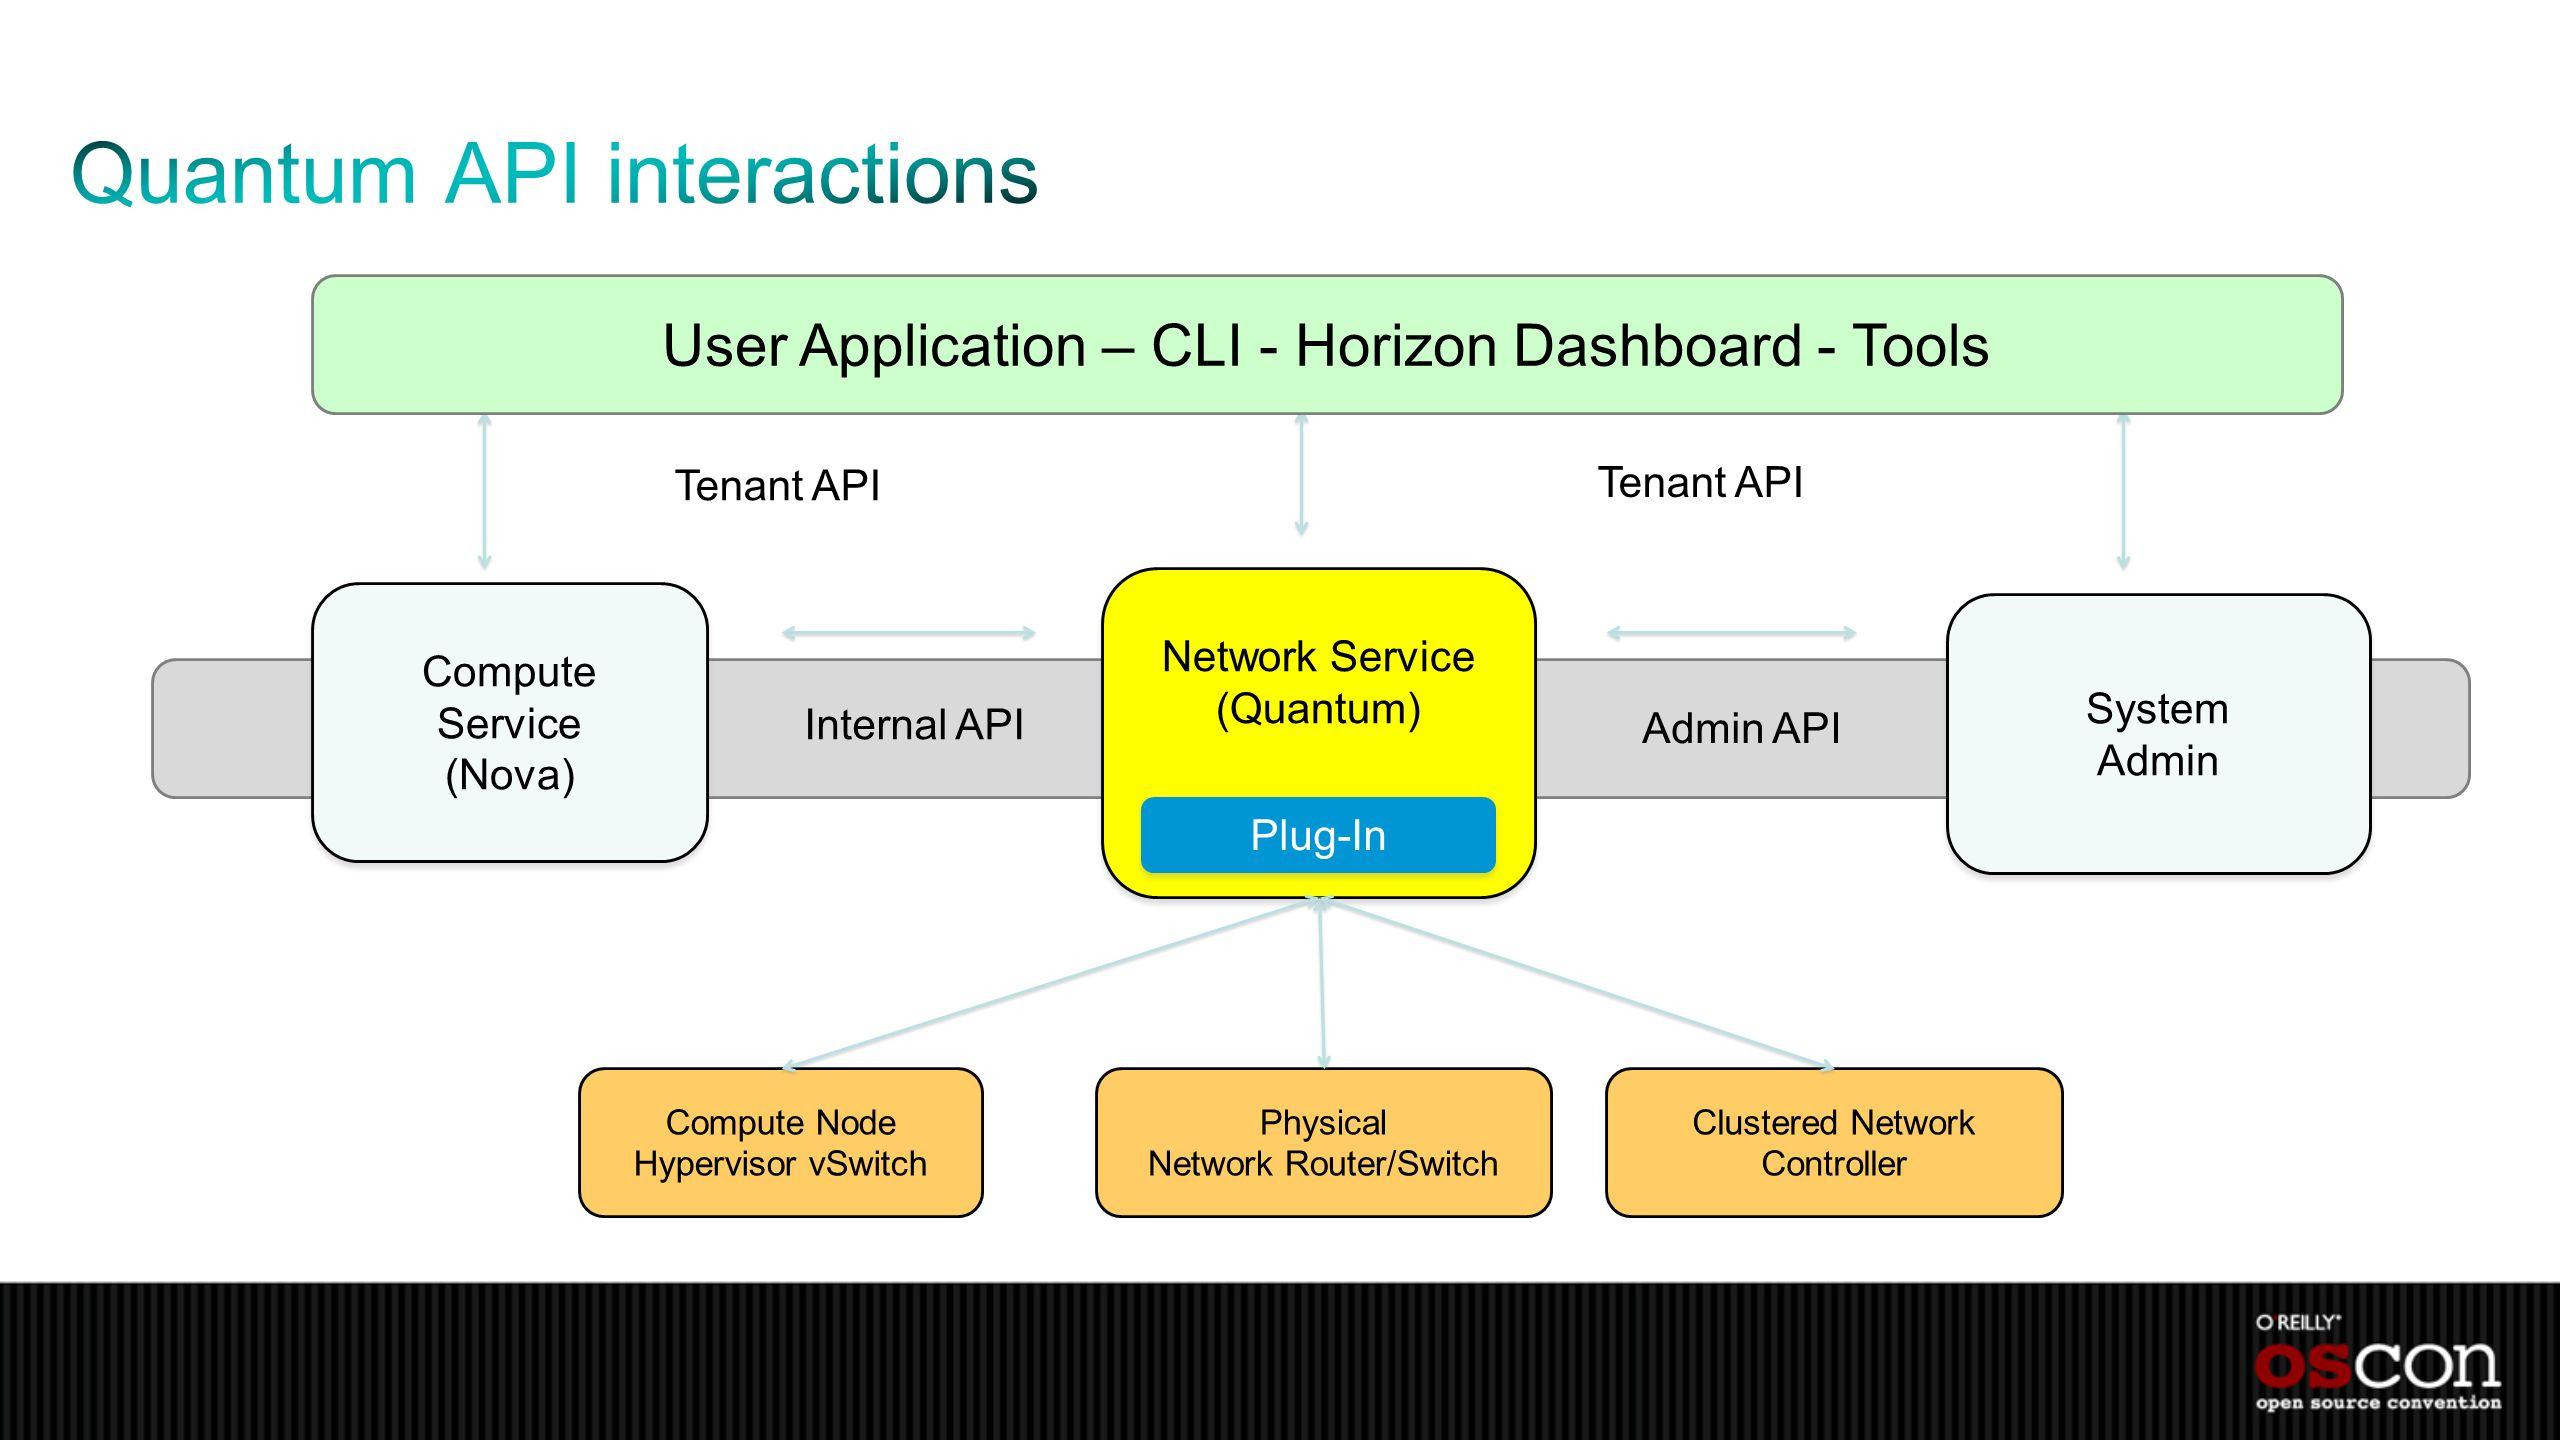 Compute Service (Nova) Compute Service (Nova) Network Service (Quantum) Tenant API Internal API Admin API System Admin System Admin Plug-In User Appli